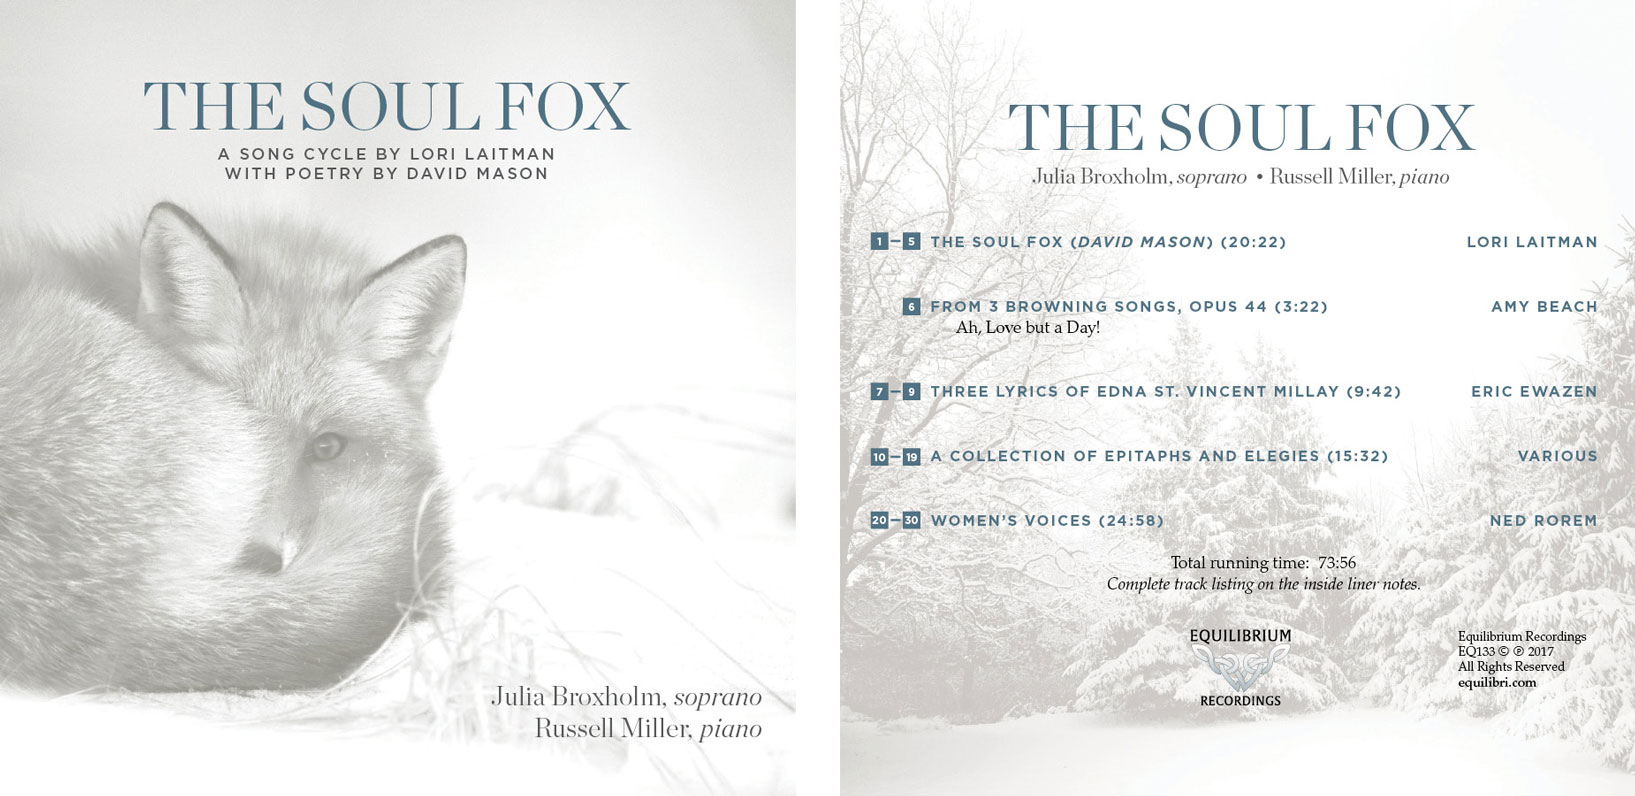 The Soul Fox album cover - Julia Broxholm